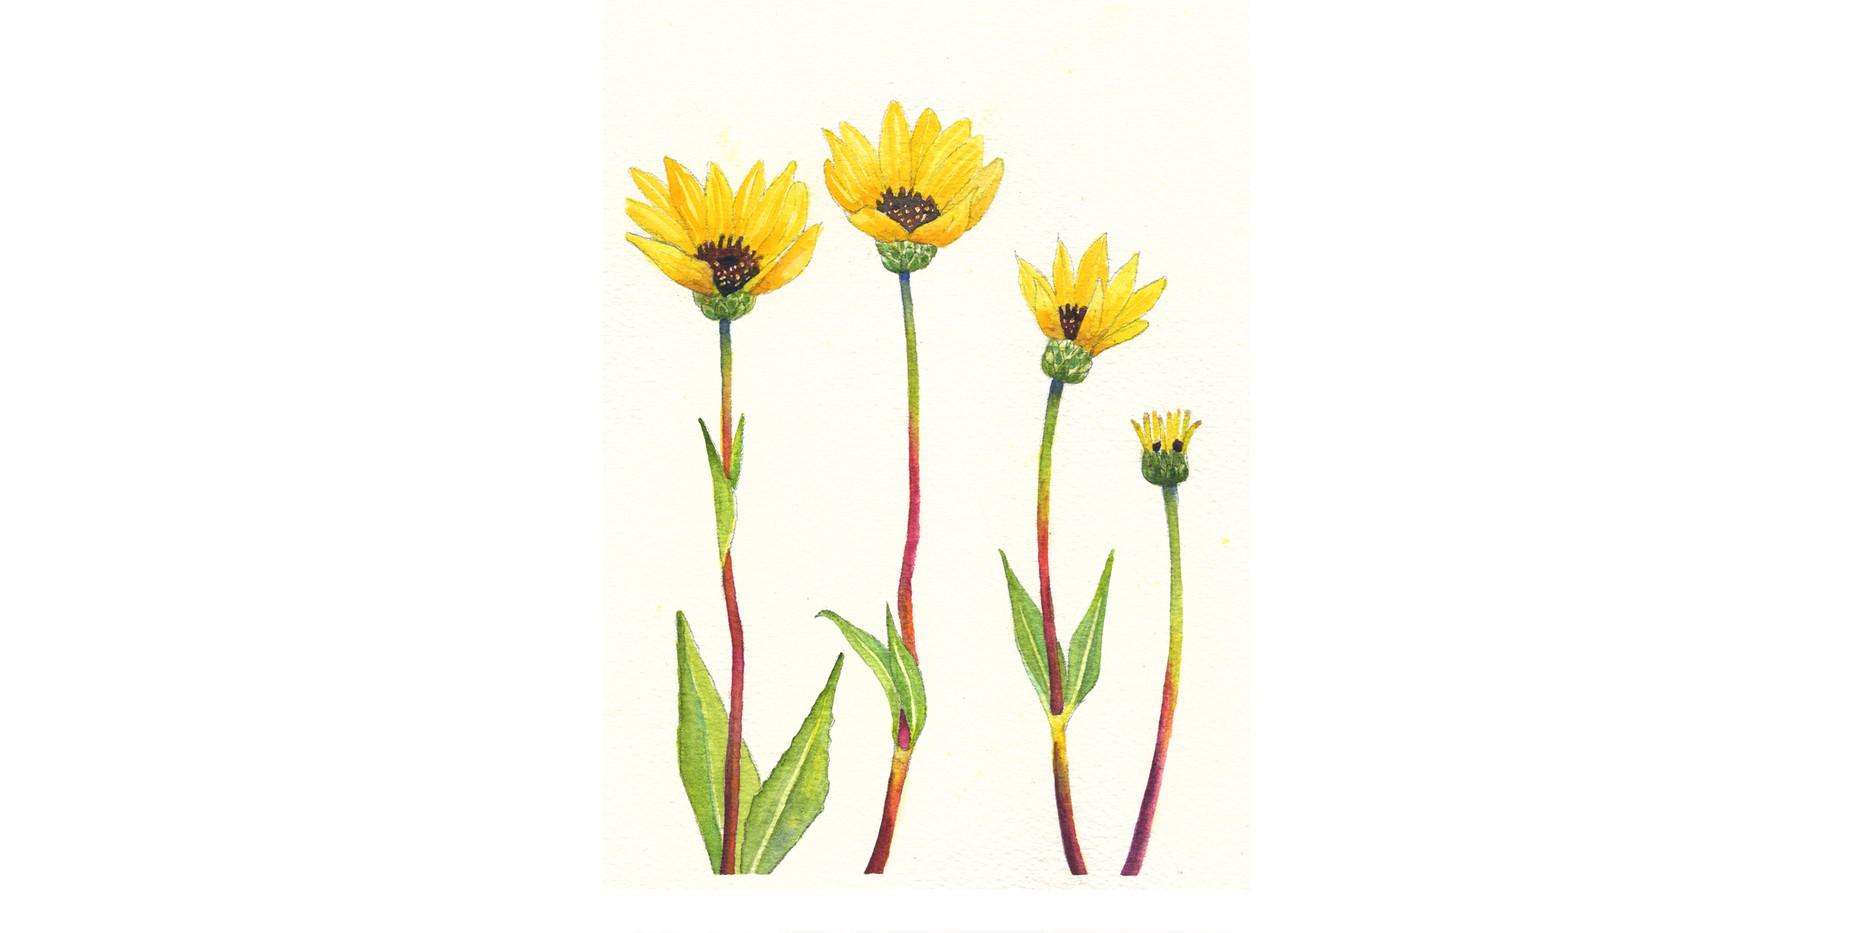 Rhombic-leaved Sunflowers